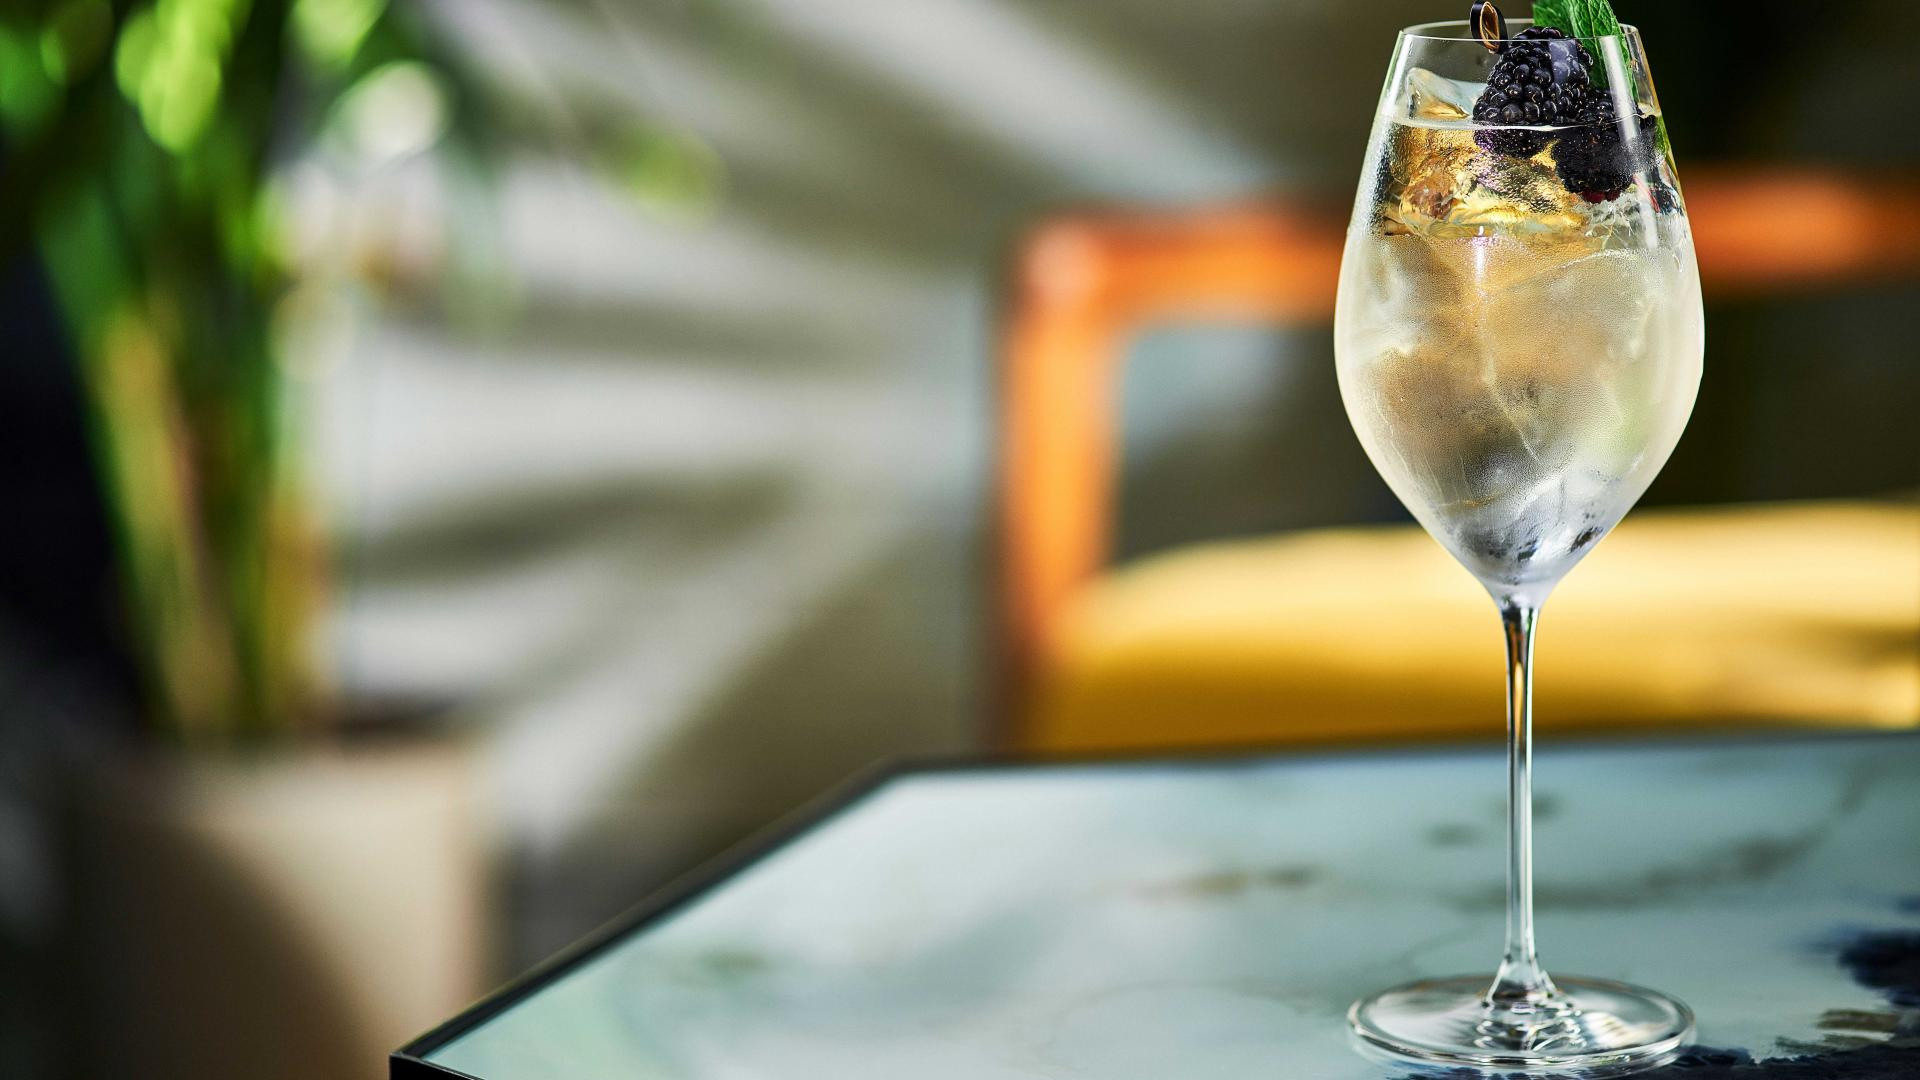 Spritz recipes: Belvedere Organic Infusions blackberry and lemongrass spritz